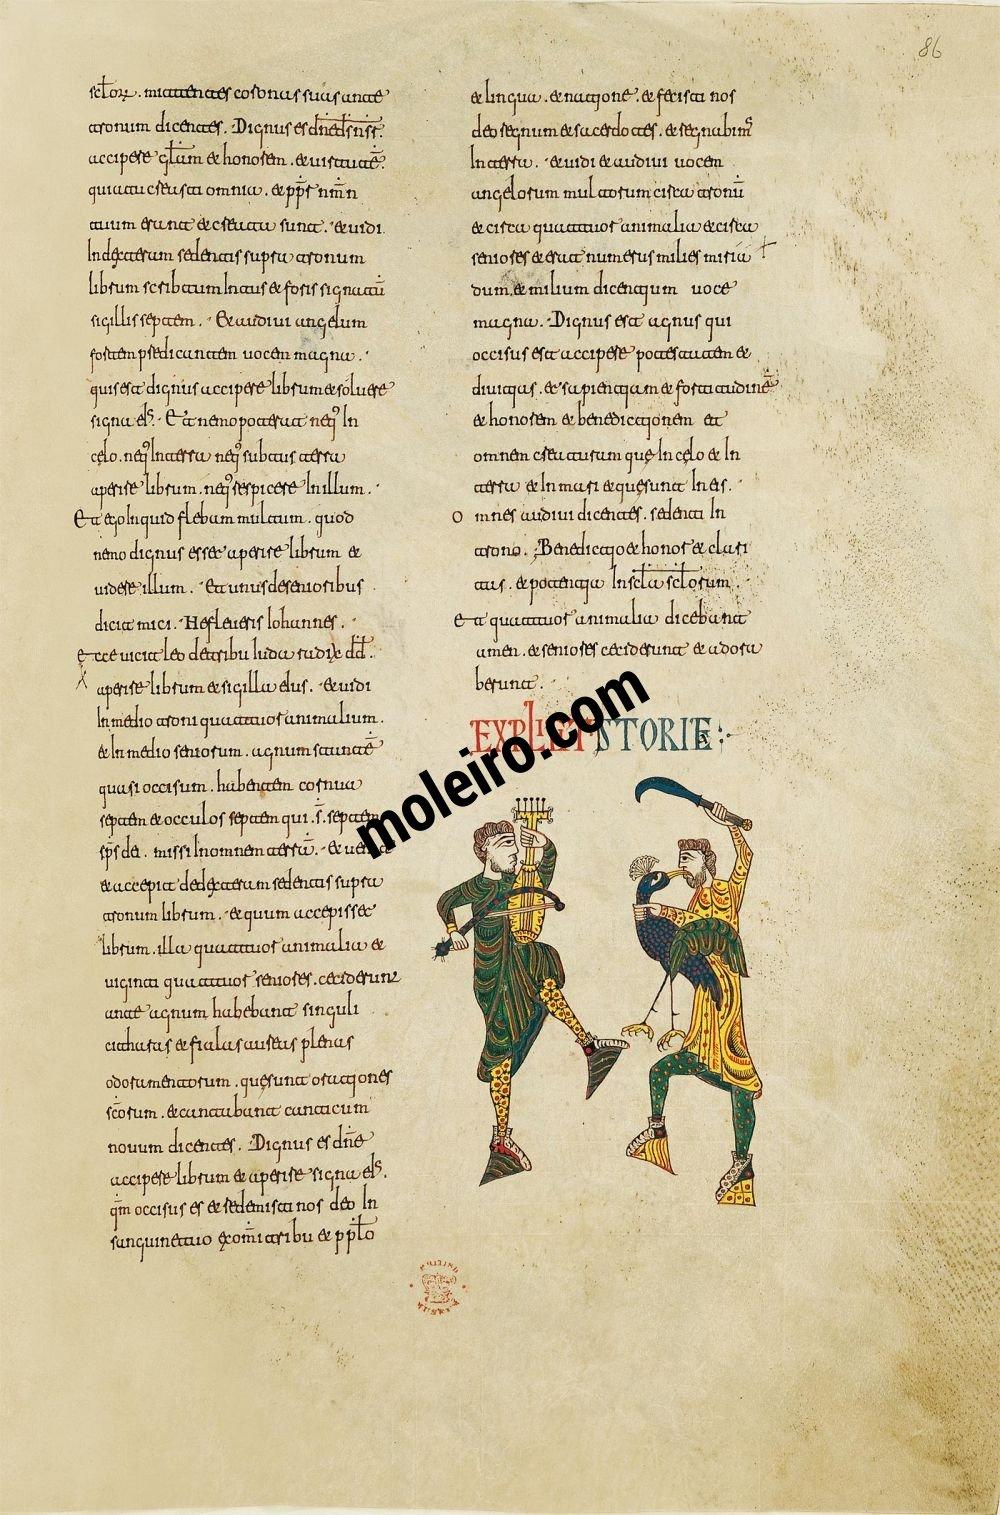 Beato de Silos f. 86r, Two jugglers, Petrus